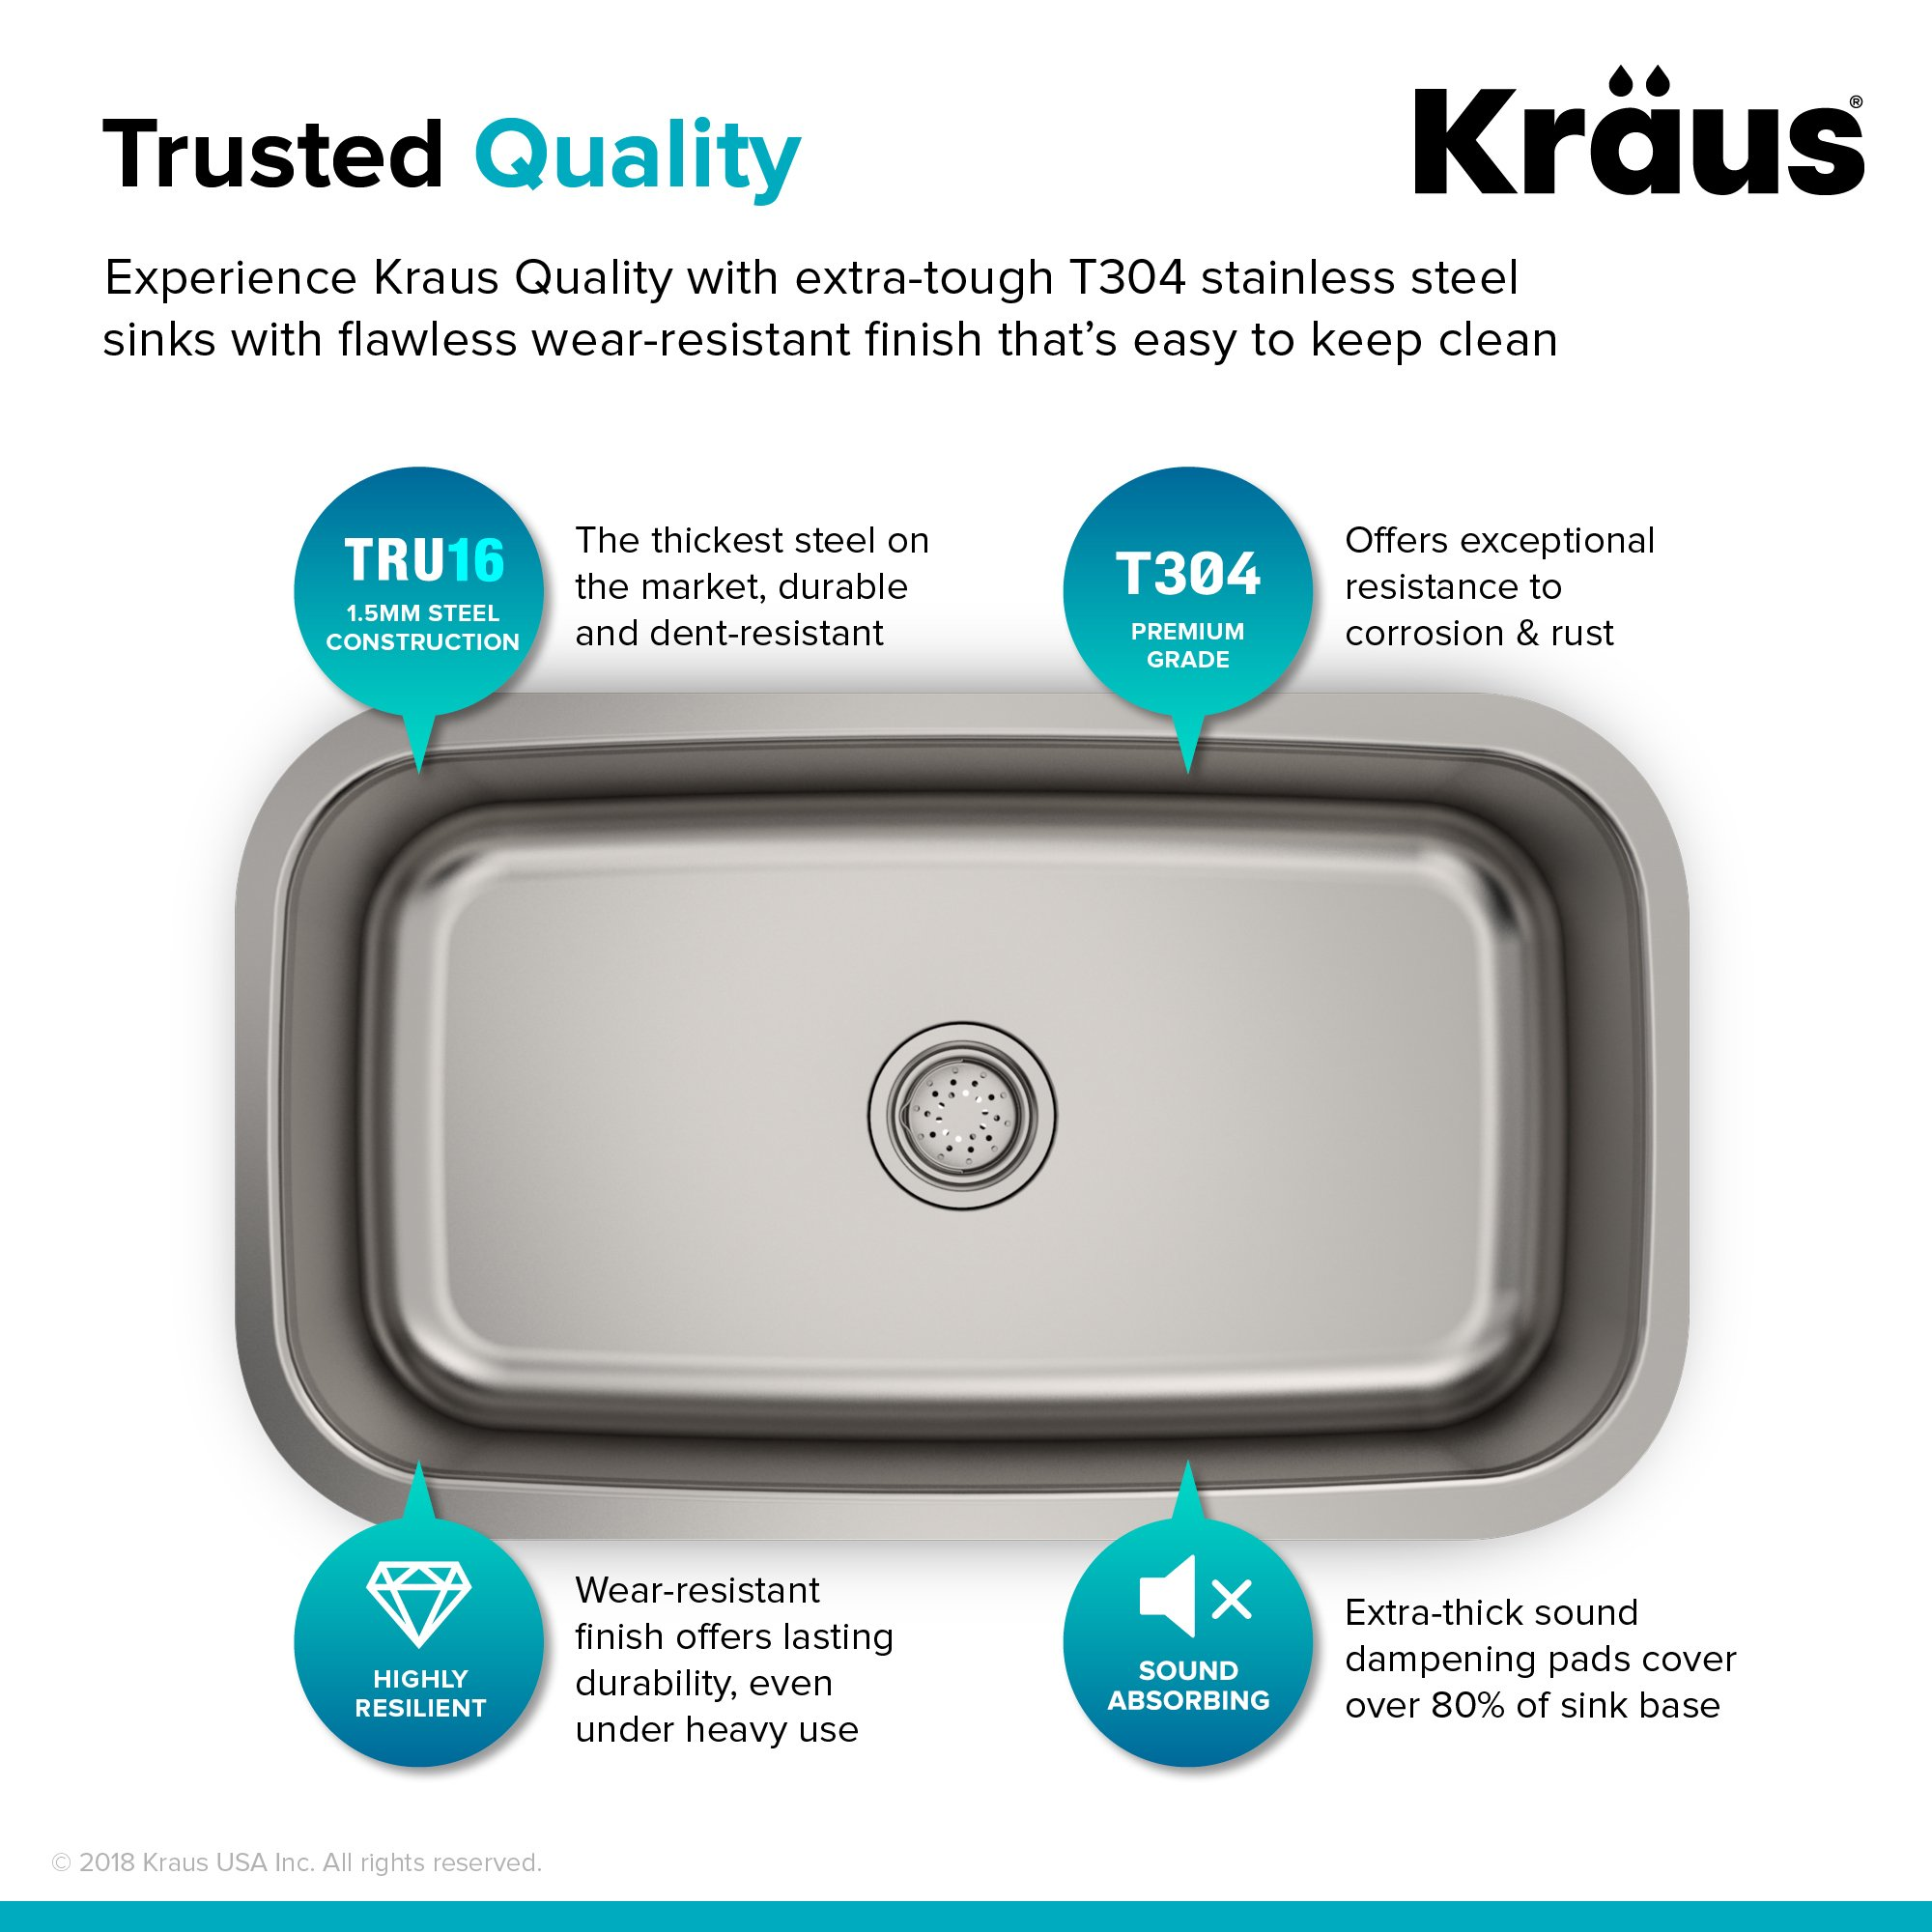 Kraus KBU14 31-1/2 inch Undermount Single Bowl 16-gauge Stainless Steel Kitchen Sink by Kraus (Image #5)